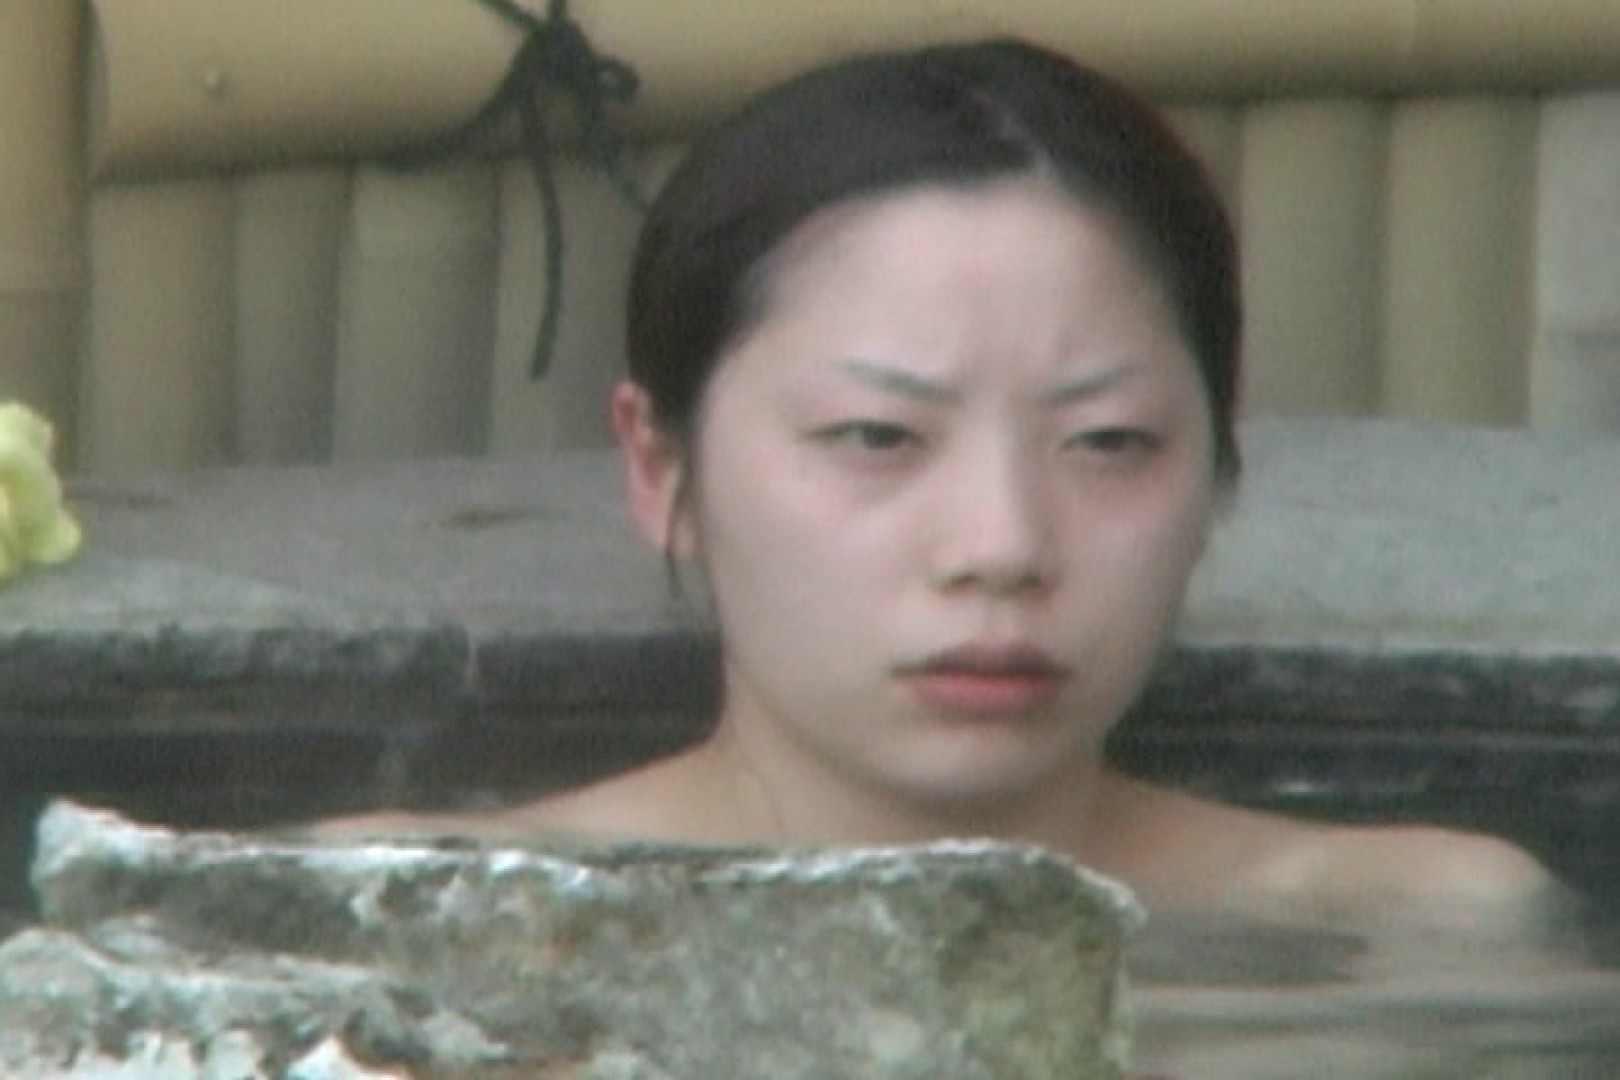 Aquaな露天風呂Vol.596 盗撮シリーズ | 露天風呂編  113PIX 9